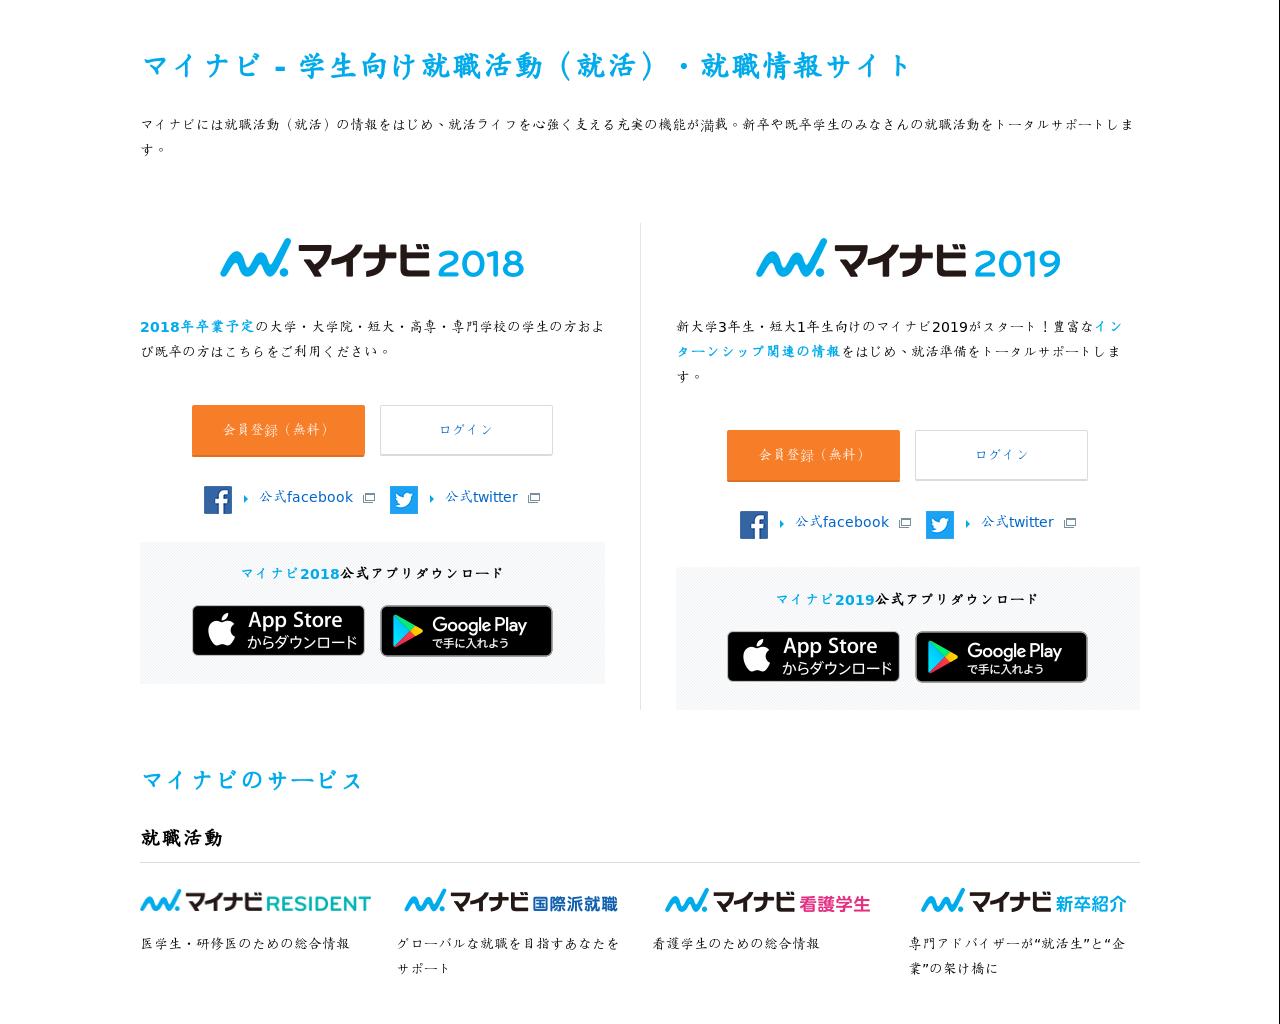 job.mynavi.jp(2017/12/20 11:50:39)